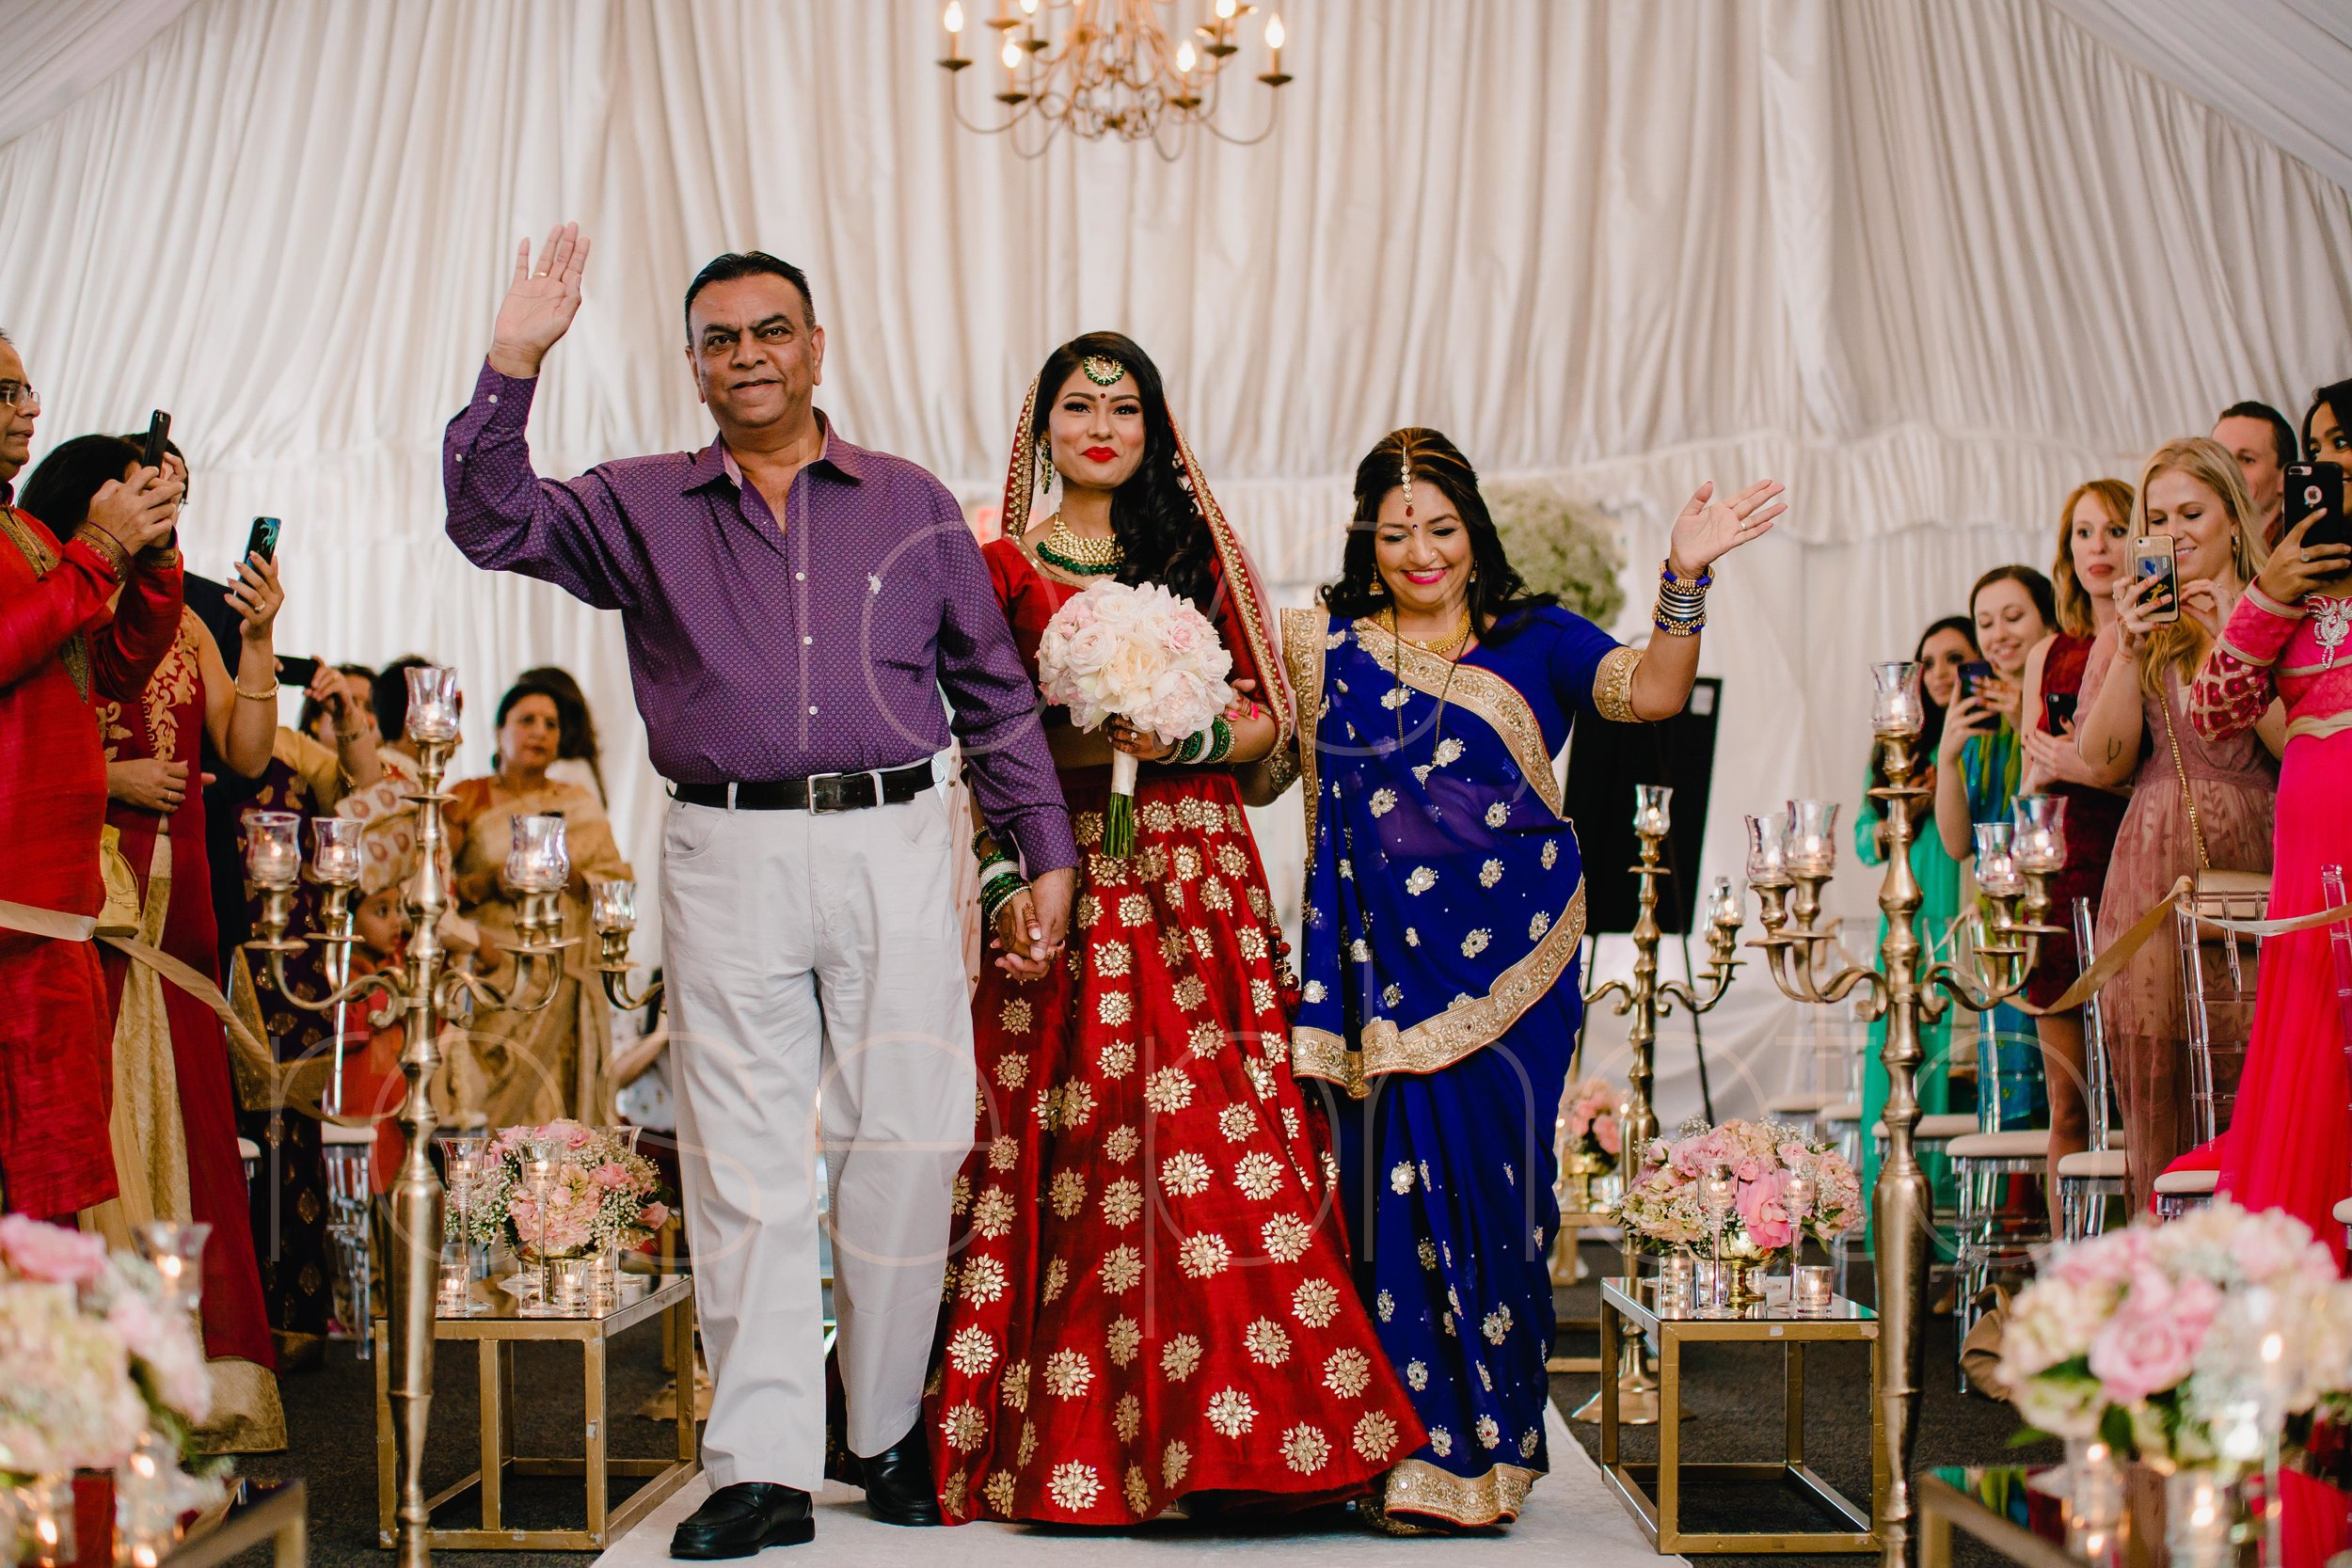 Chicago Indian Wedding best photography lifestyle wedding portrait luxury wedding-32.jpg